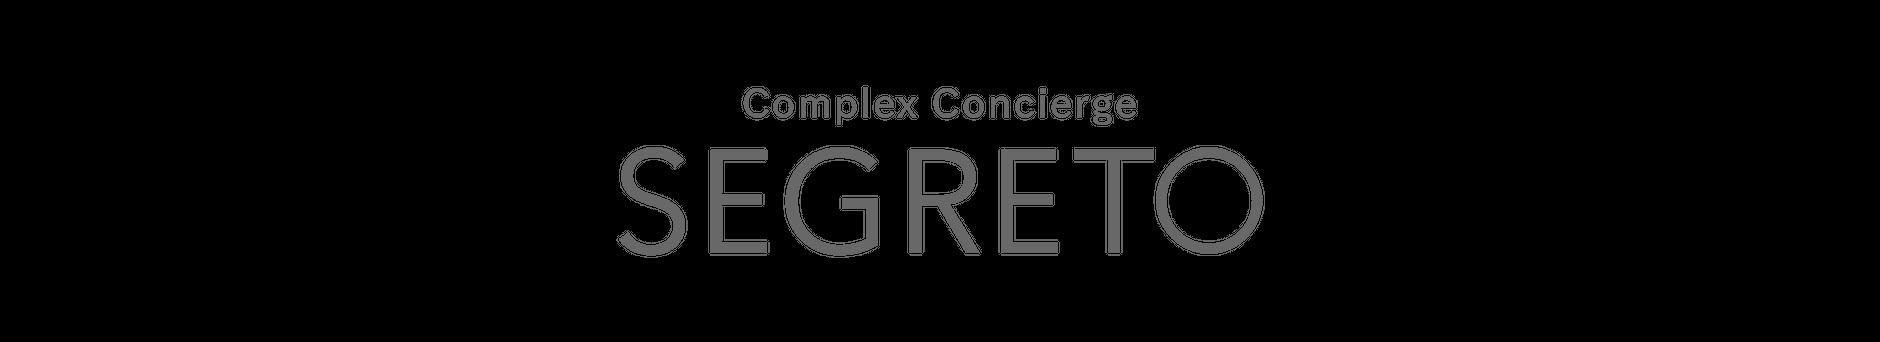 Complex Concierge